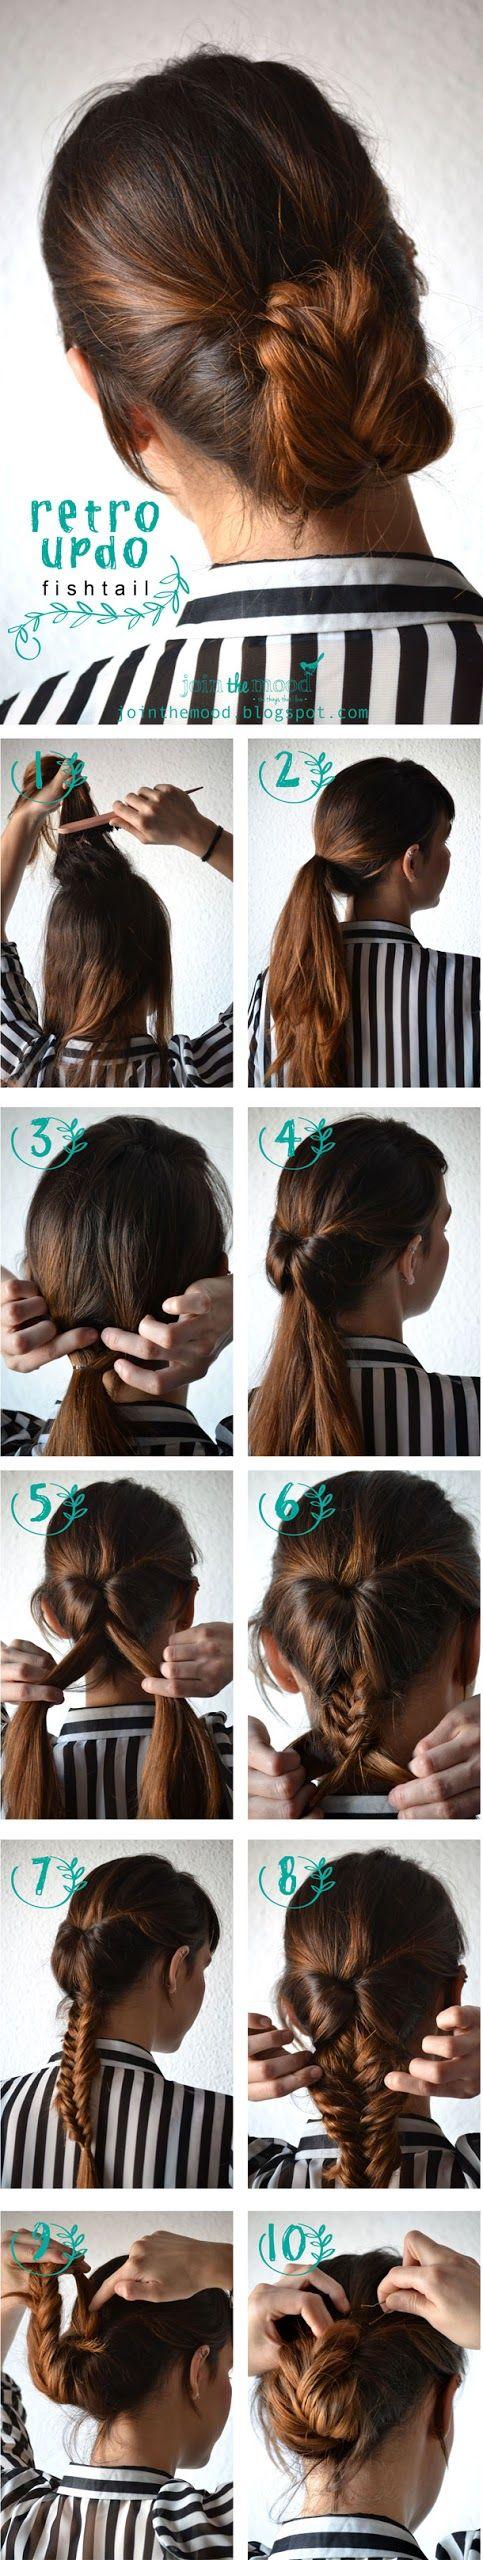 best hair styles images on pinterest hair makeup cute